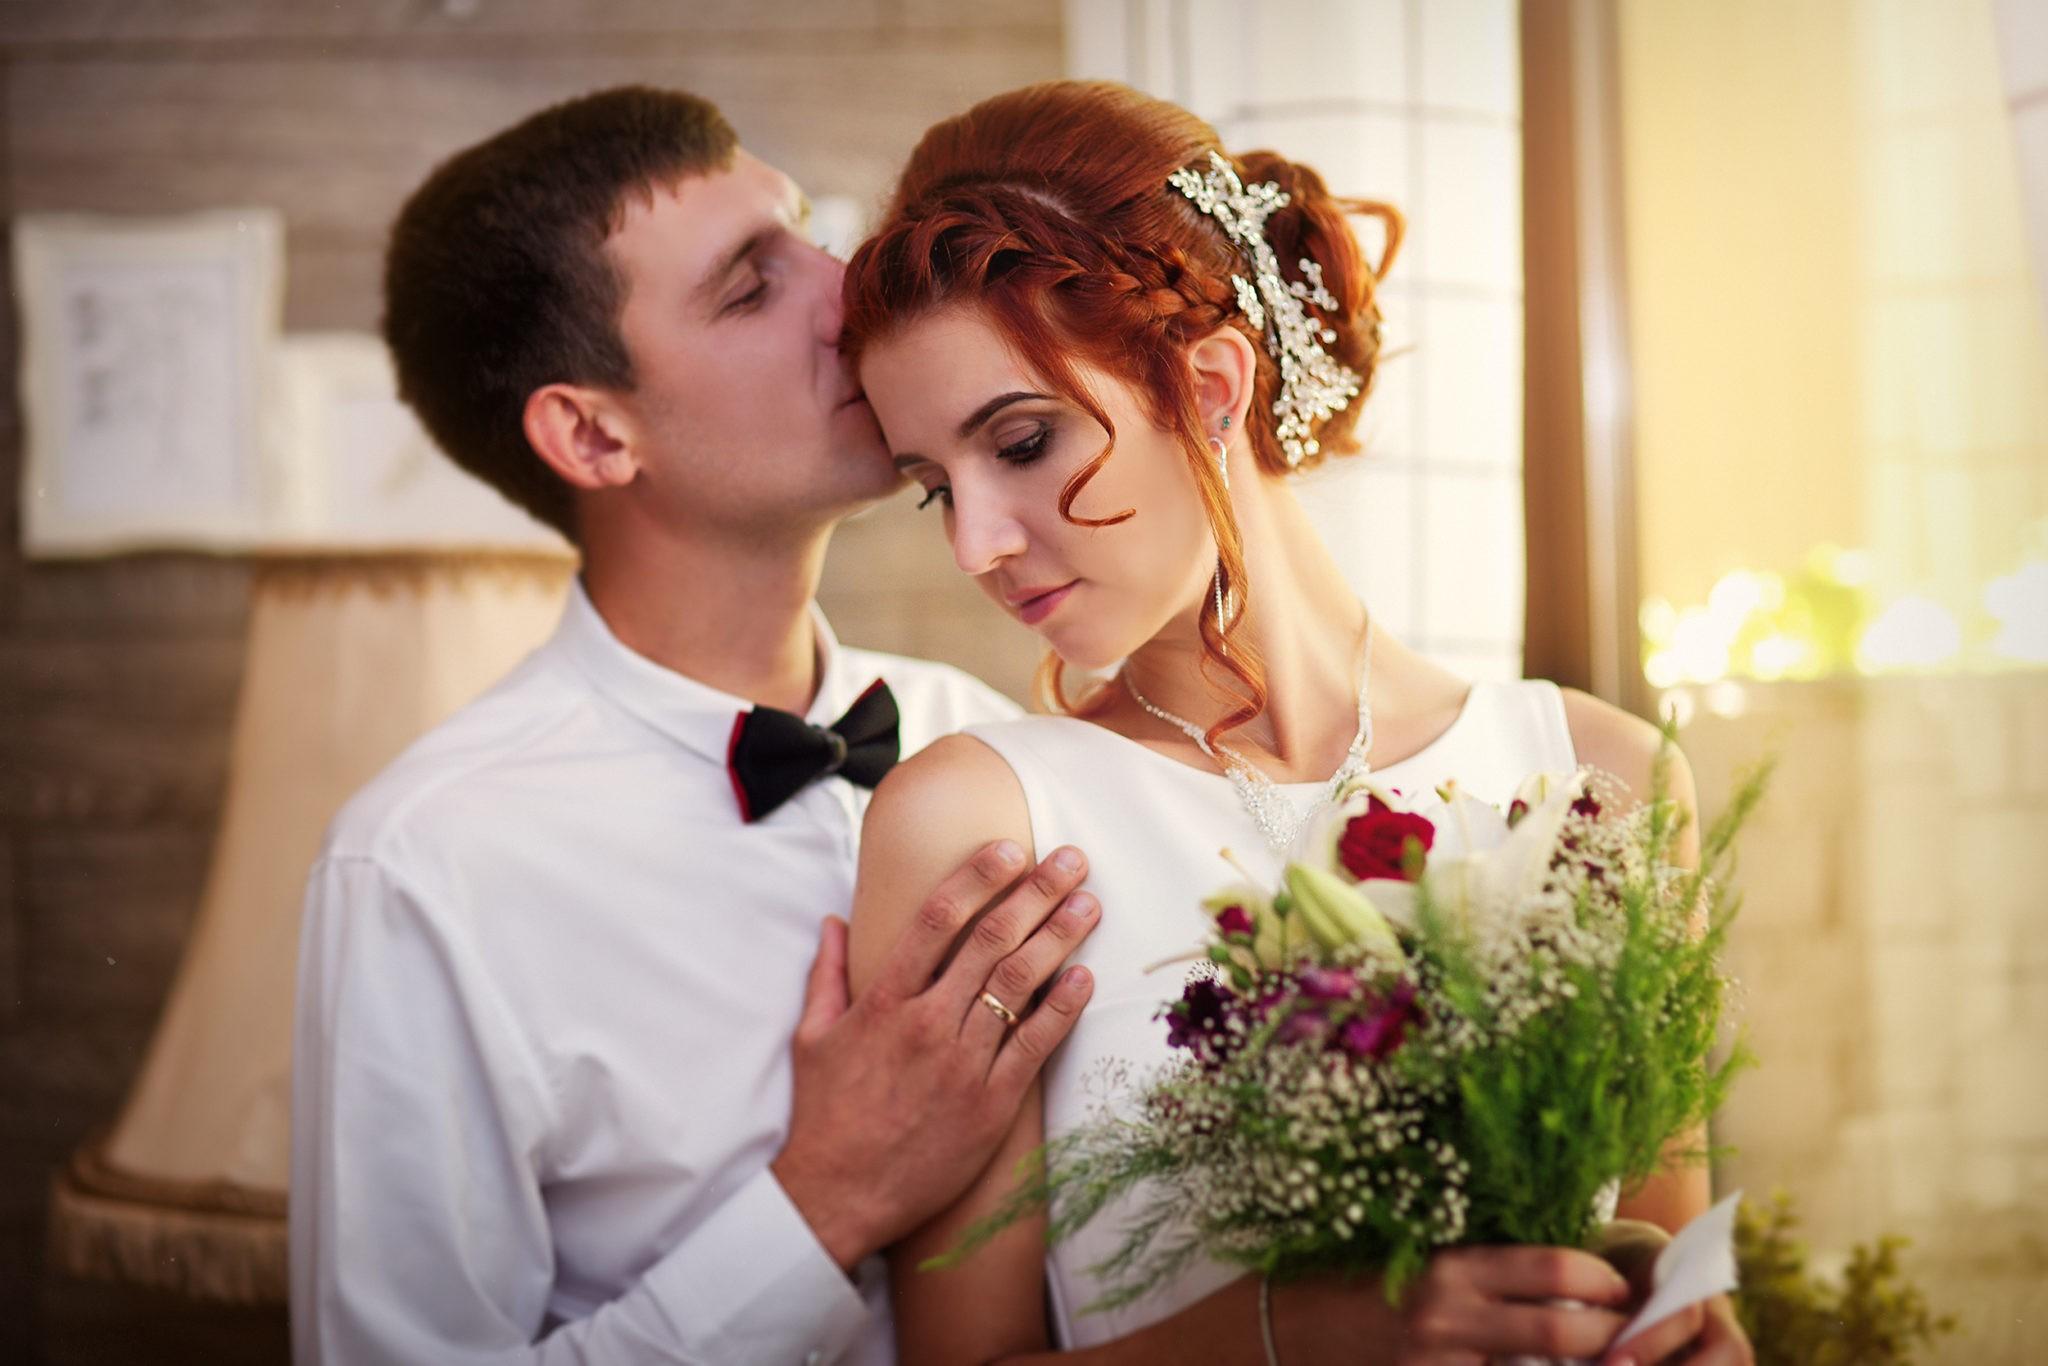 Свадебная съемка с от свадебного фотографа молодожены в кафе